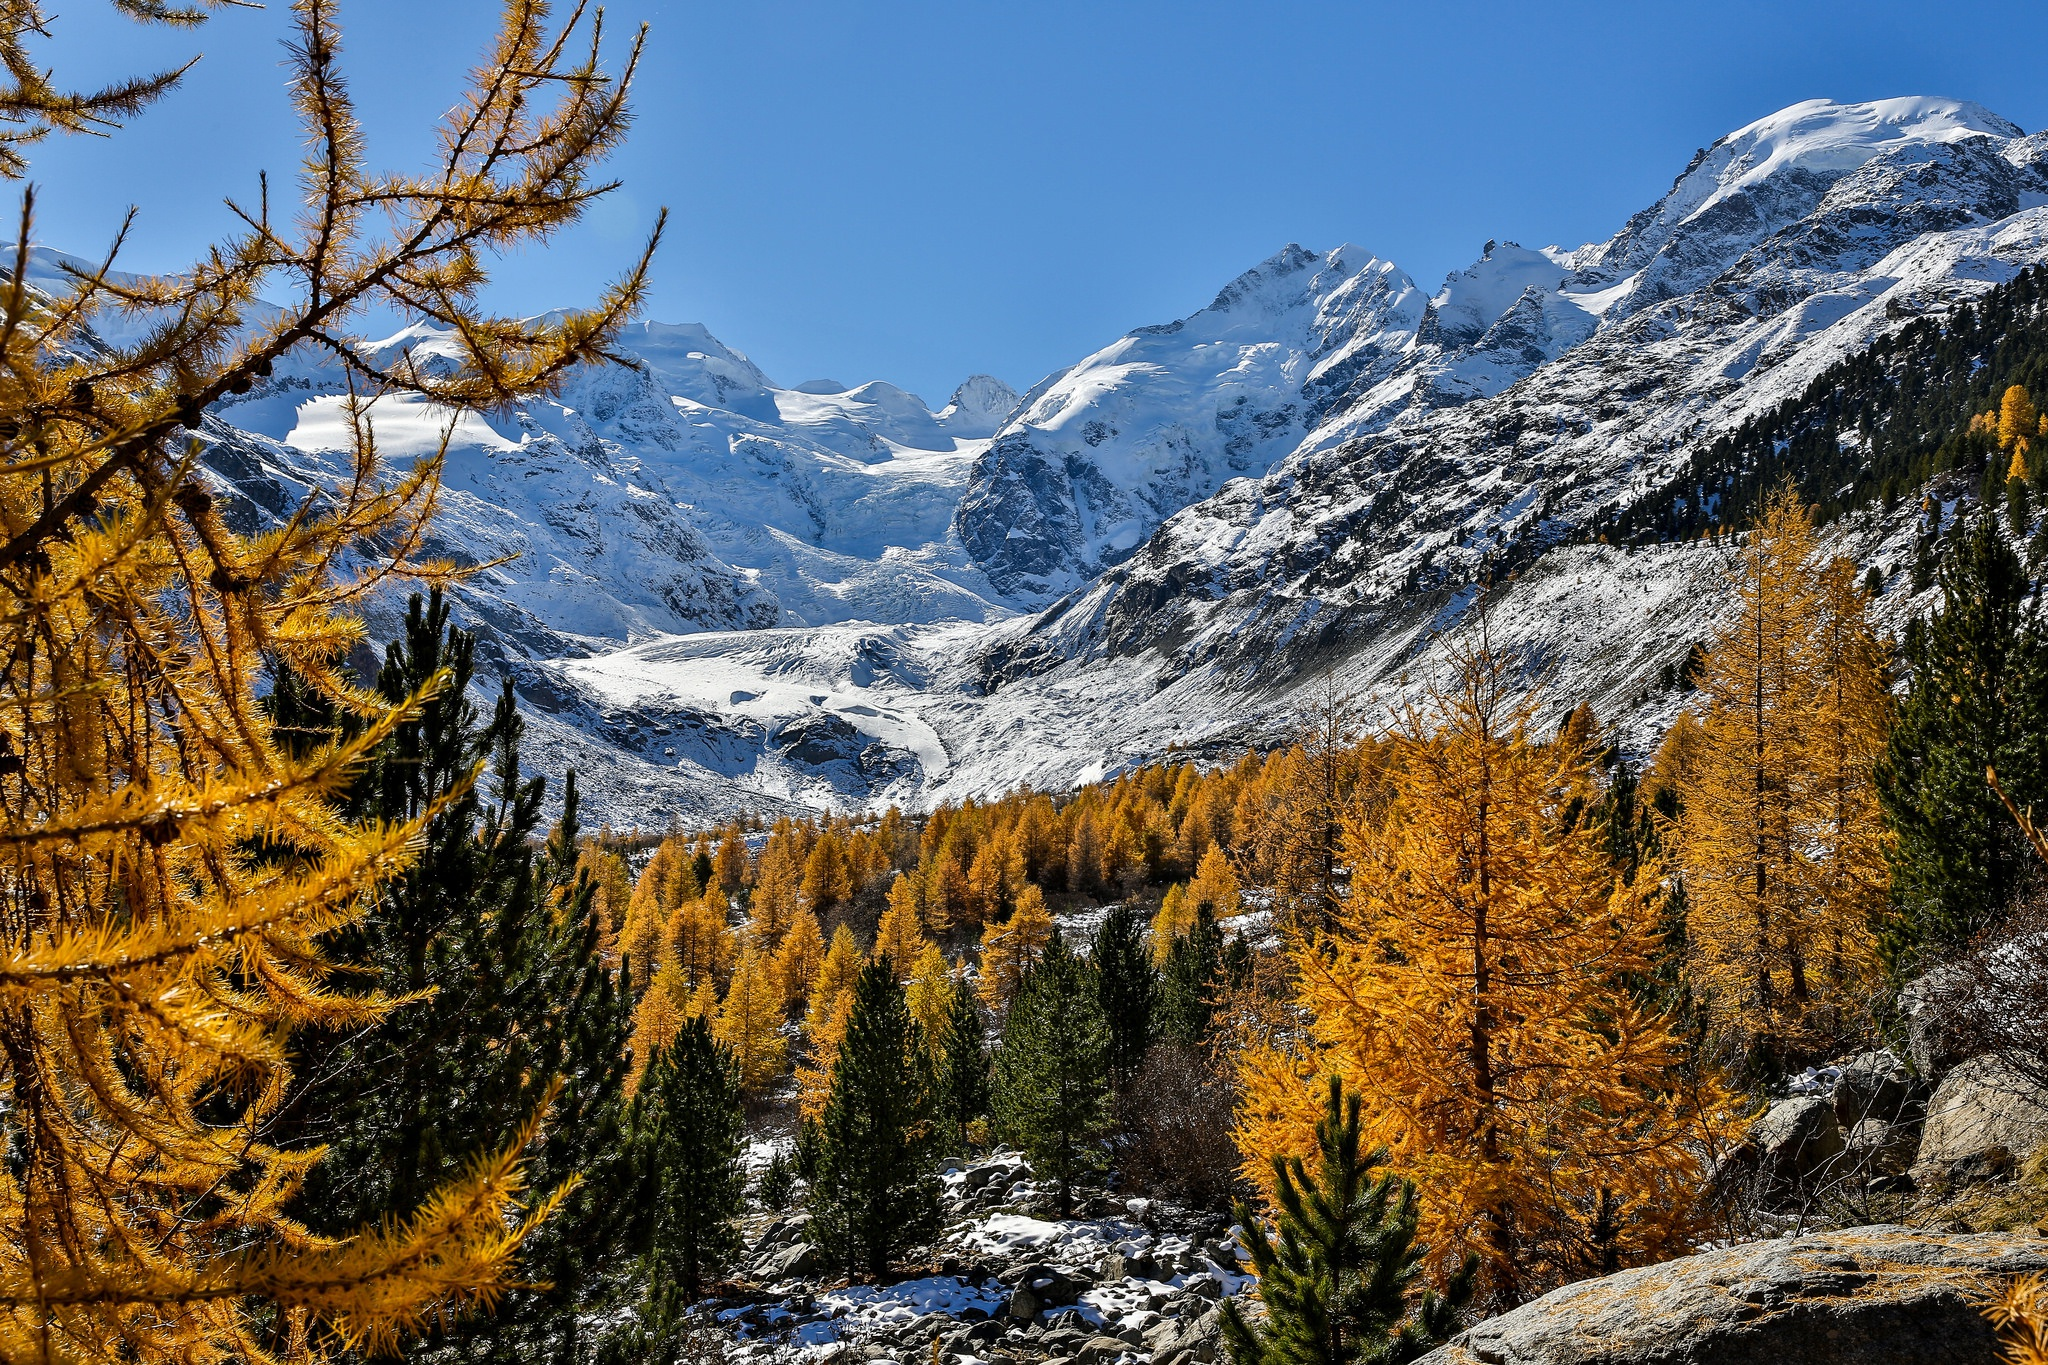 Piz Bernina, Moteratsch Glacier, Engadine, Switzerland  № 1473509 бесплатно